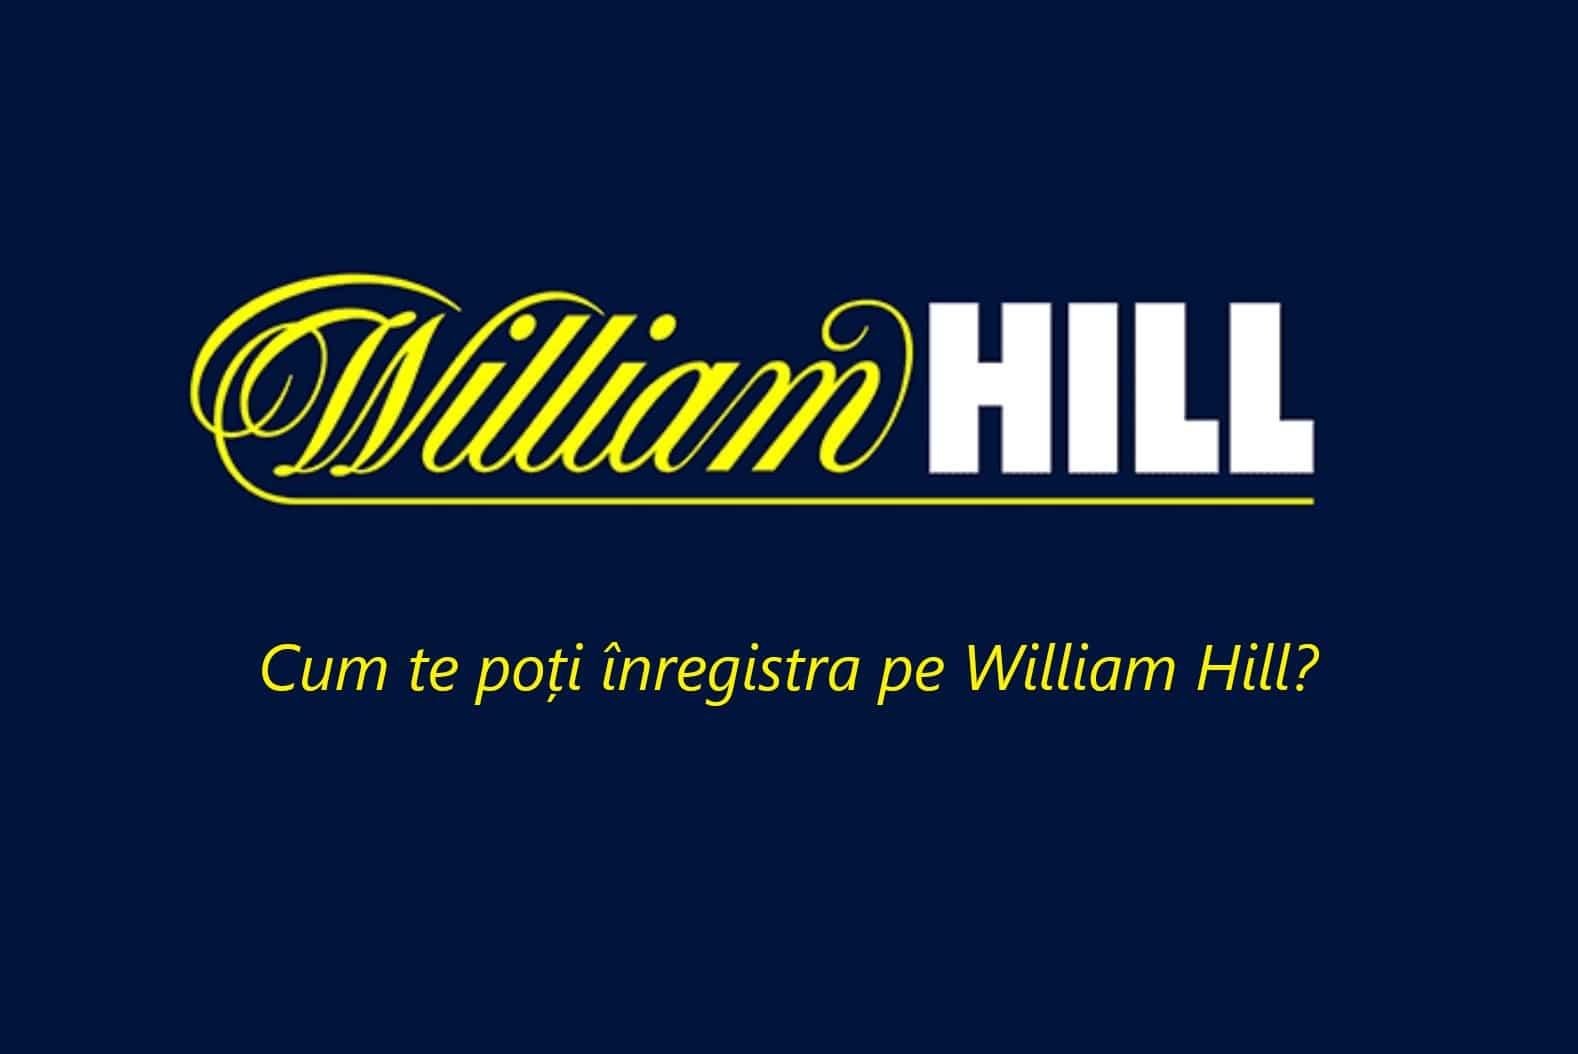 Inregistrare pe William Hill